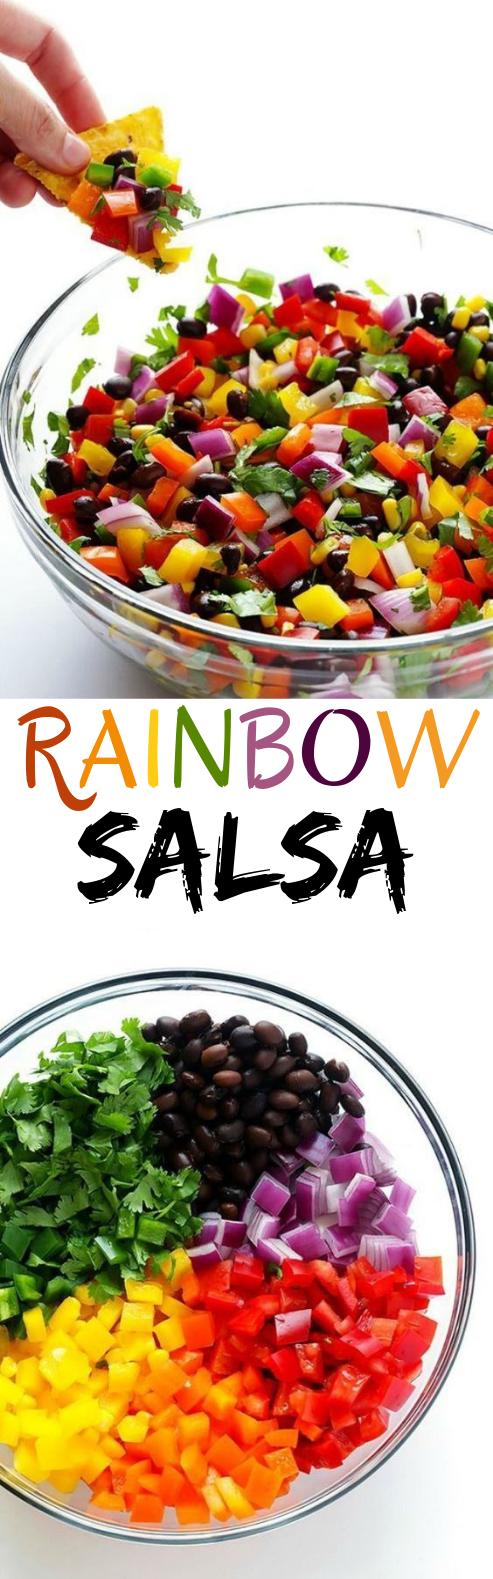 RAINBOW SALSA #vegan #healthy